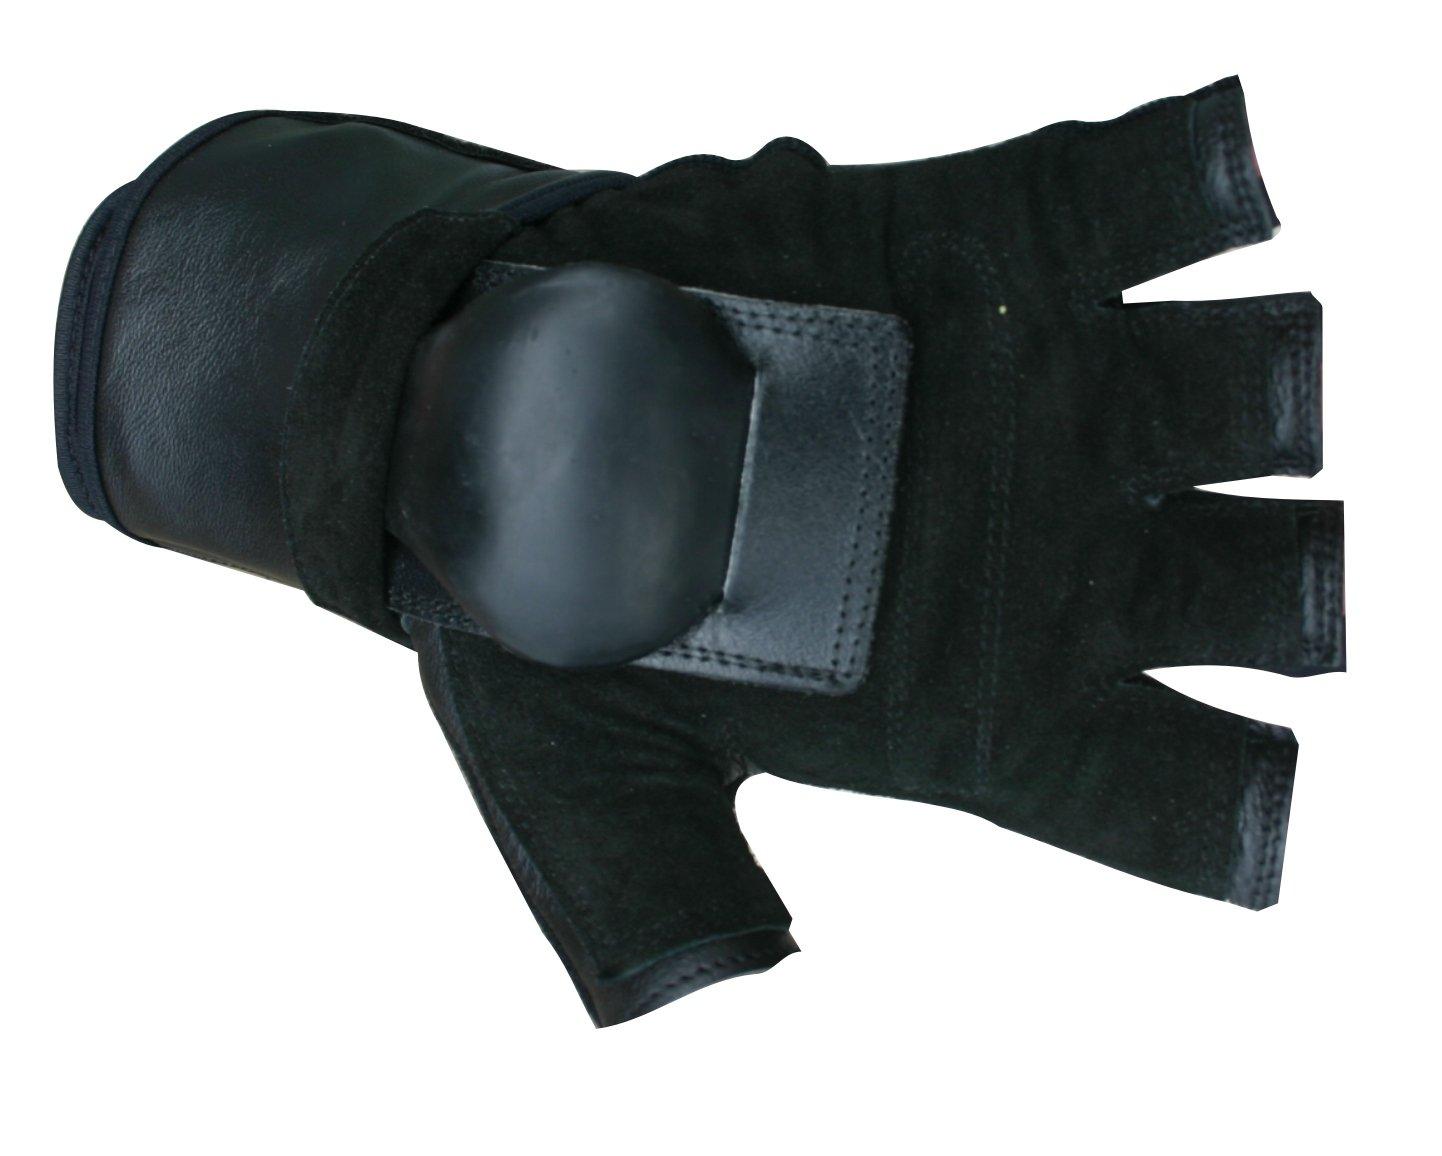 Hillbilly Wrist Guard Gloves - Half Finger (Black, Large) by Hillbilly protective gear